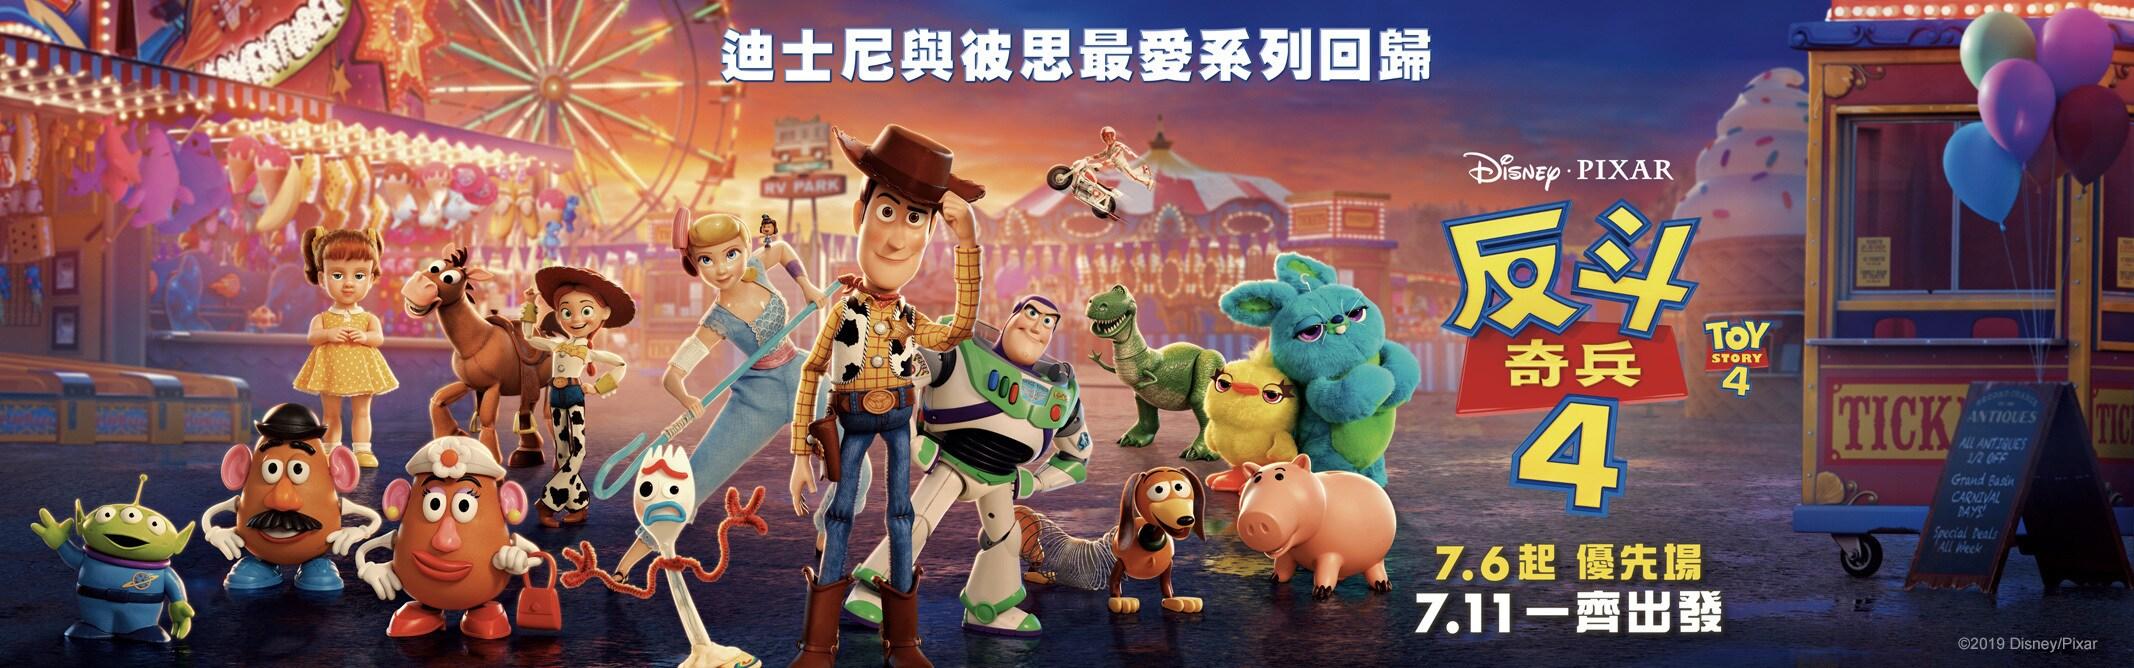 Toy Story 4 - Disney HK